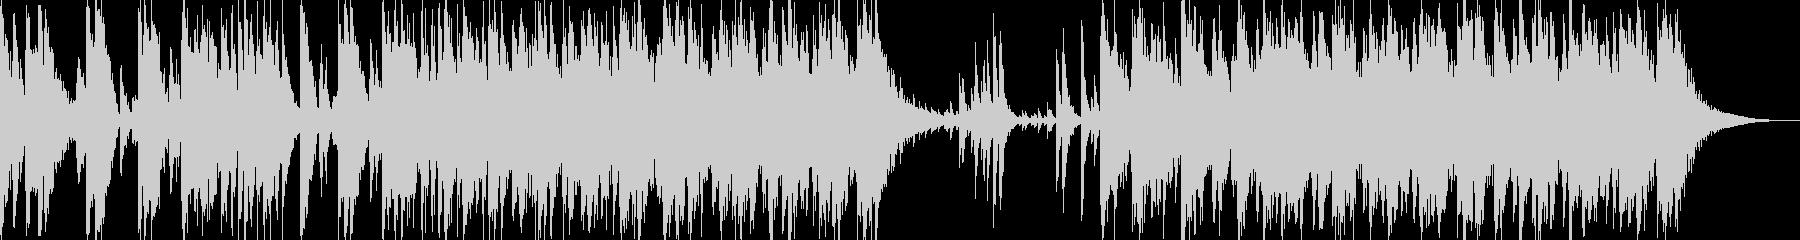 日本伝統音楽1(和太鼓)の未再生の波形